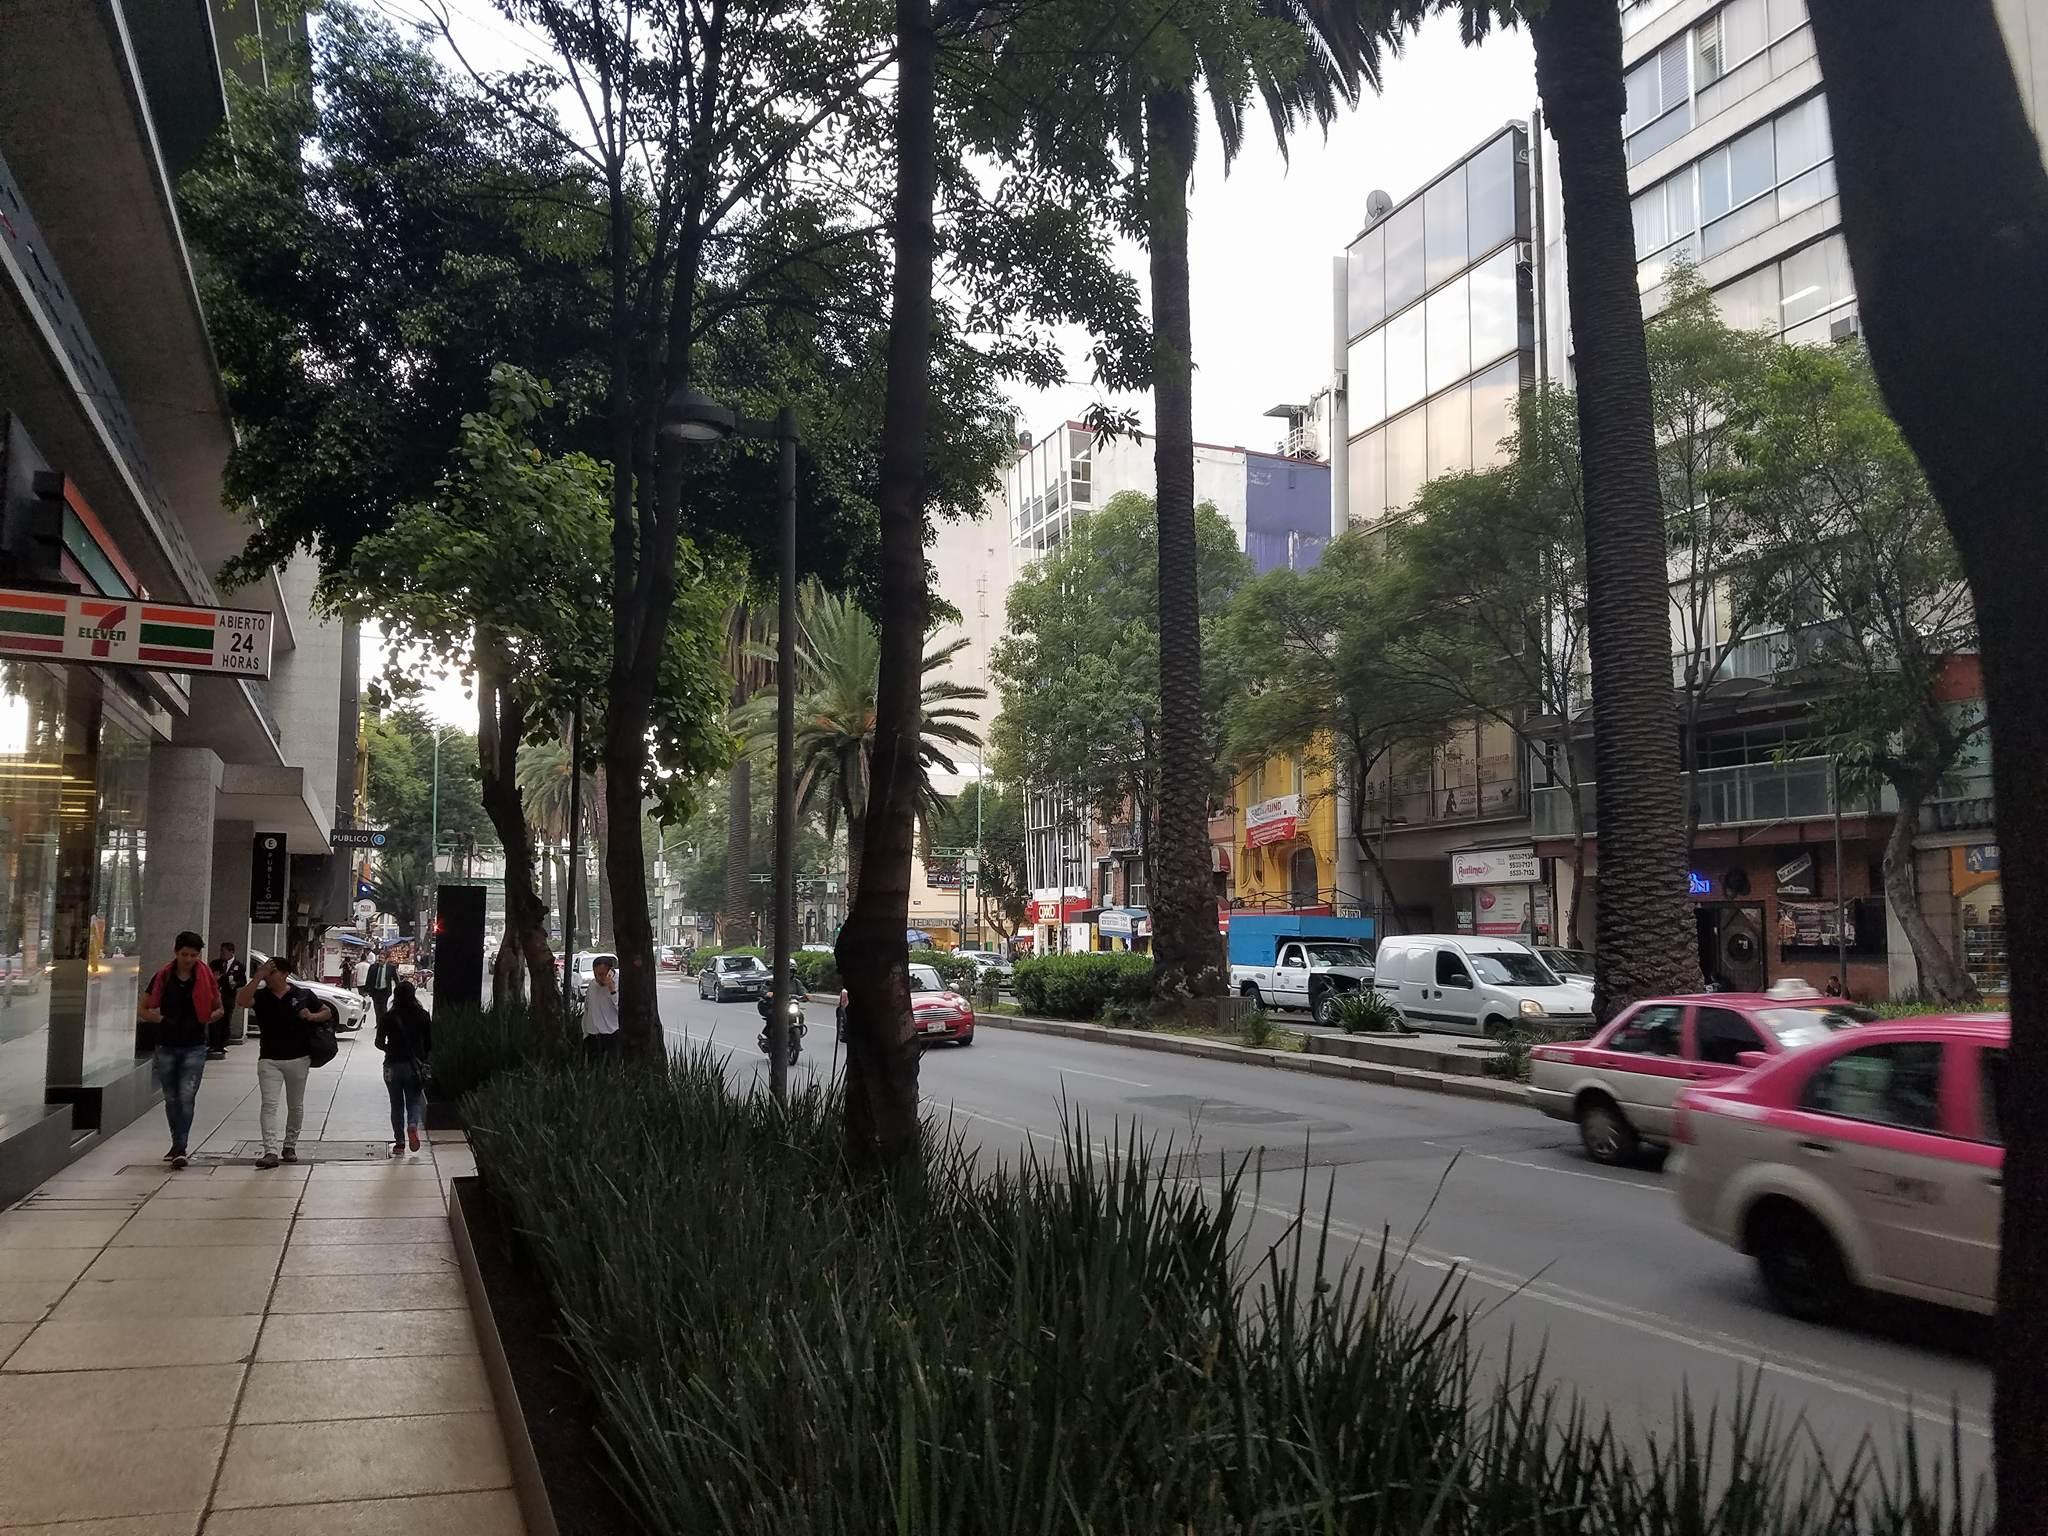 Mixed-use street in Mexico City.